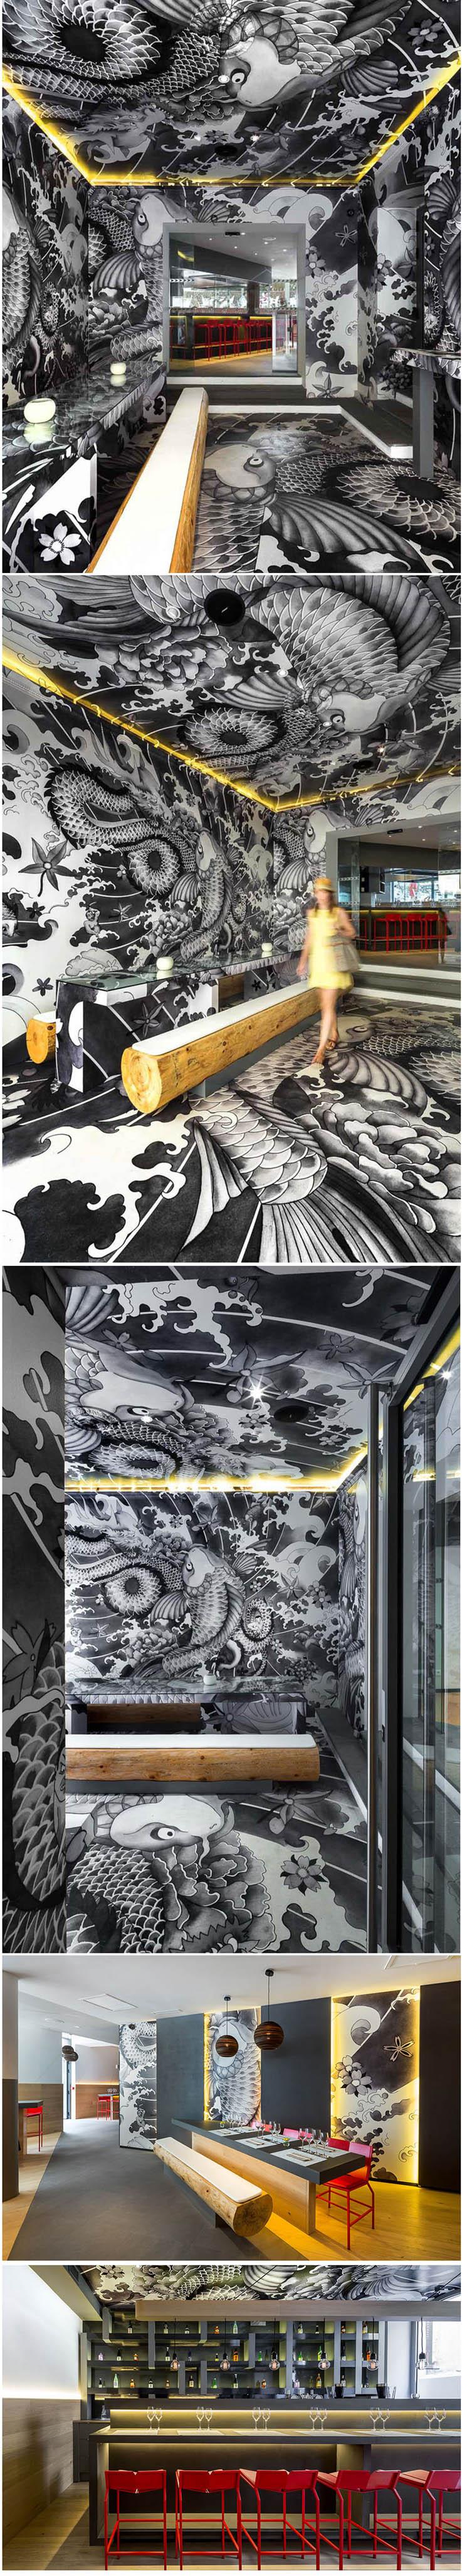 Restaurante japonês Koi tem suas paredes cobertas com tatuagem yakuza stylo urbano